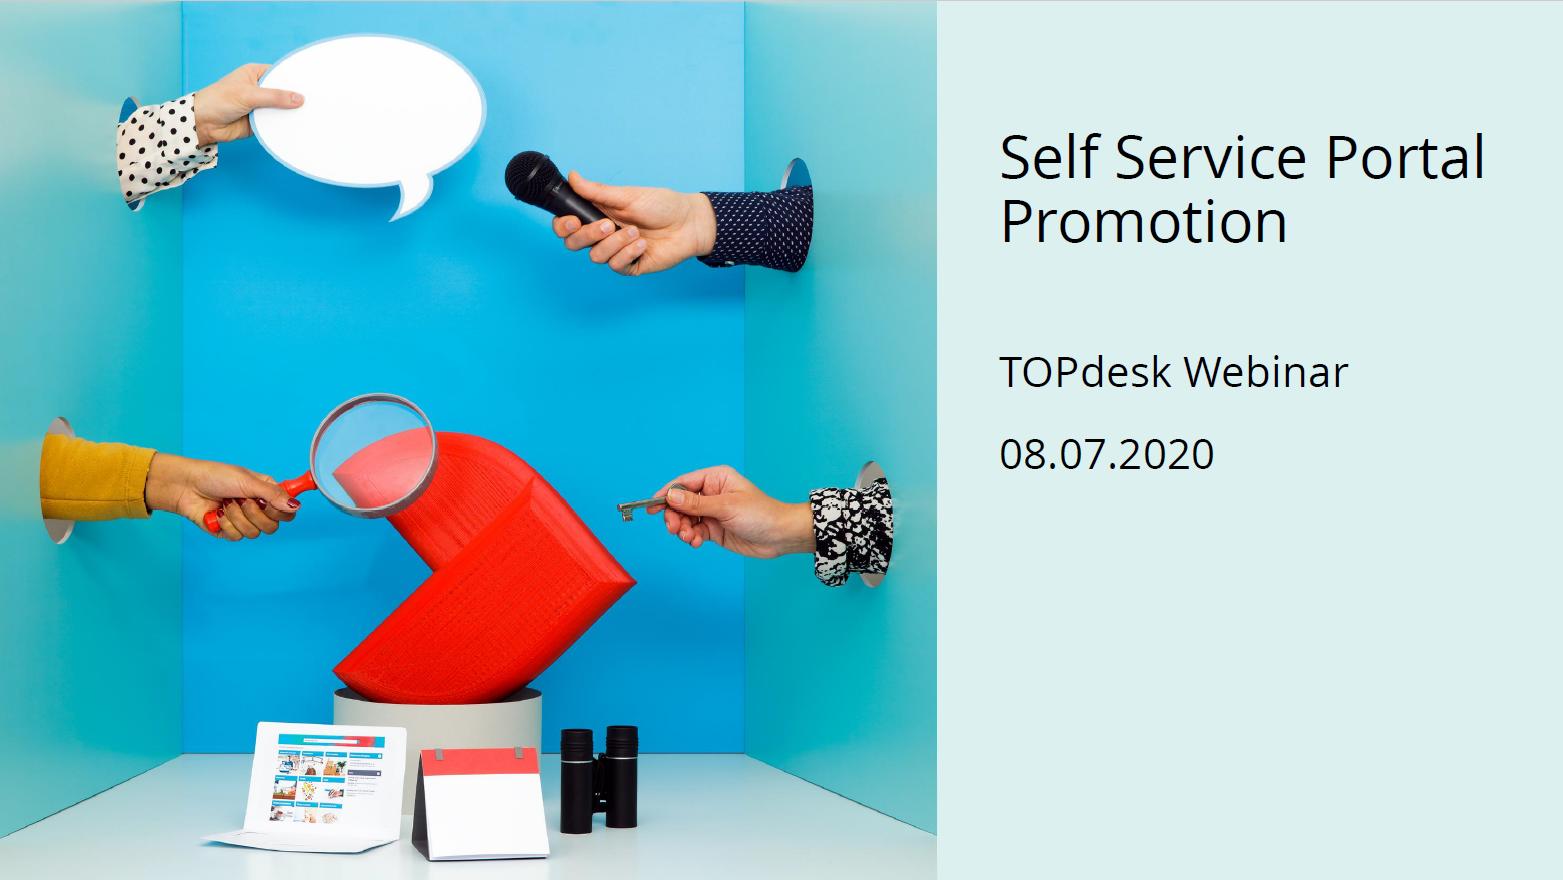 Self Service Portal Promotion Webinar